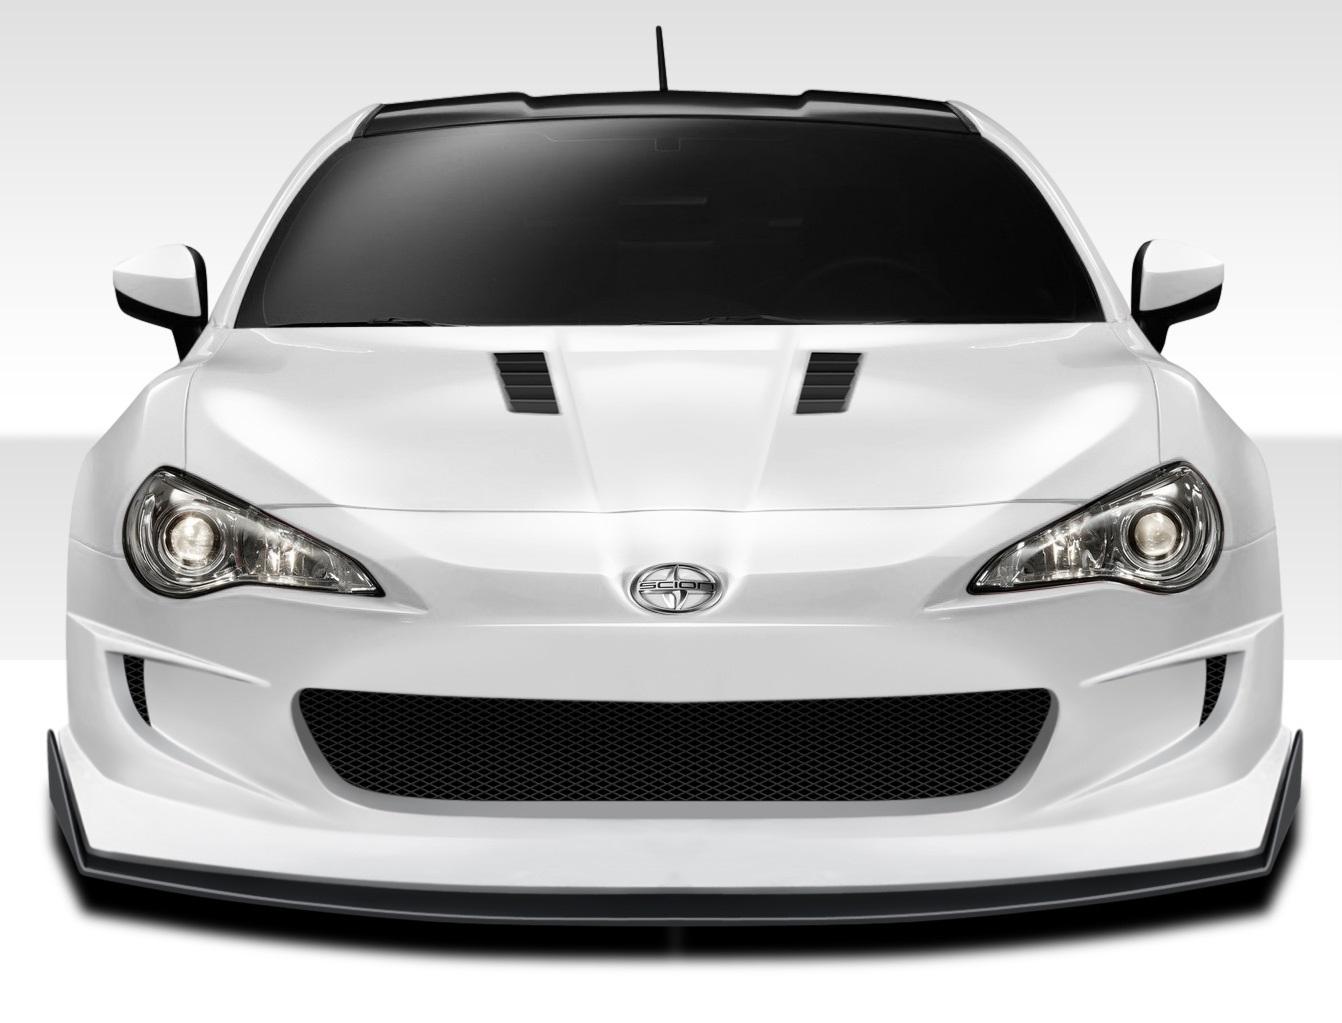 2013-2020 Scion FR-S Toyota 86 Subaru BRZ Duraflex GT Concept Front Bumper Cover - 1 Piece